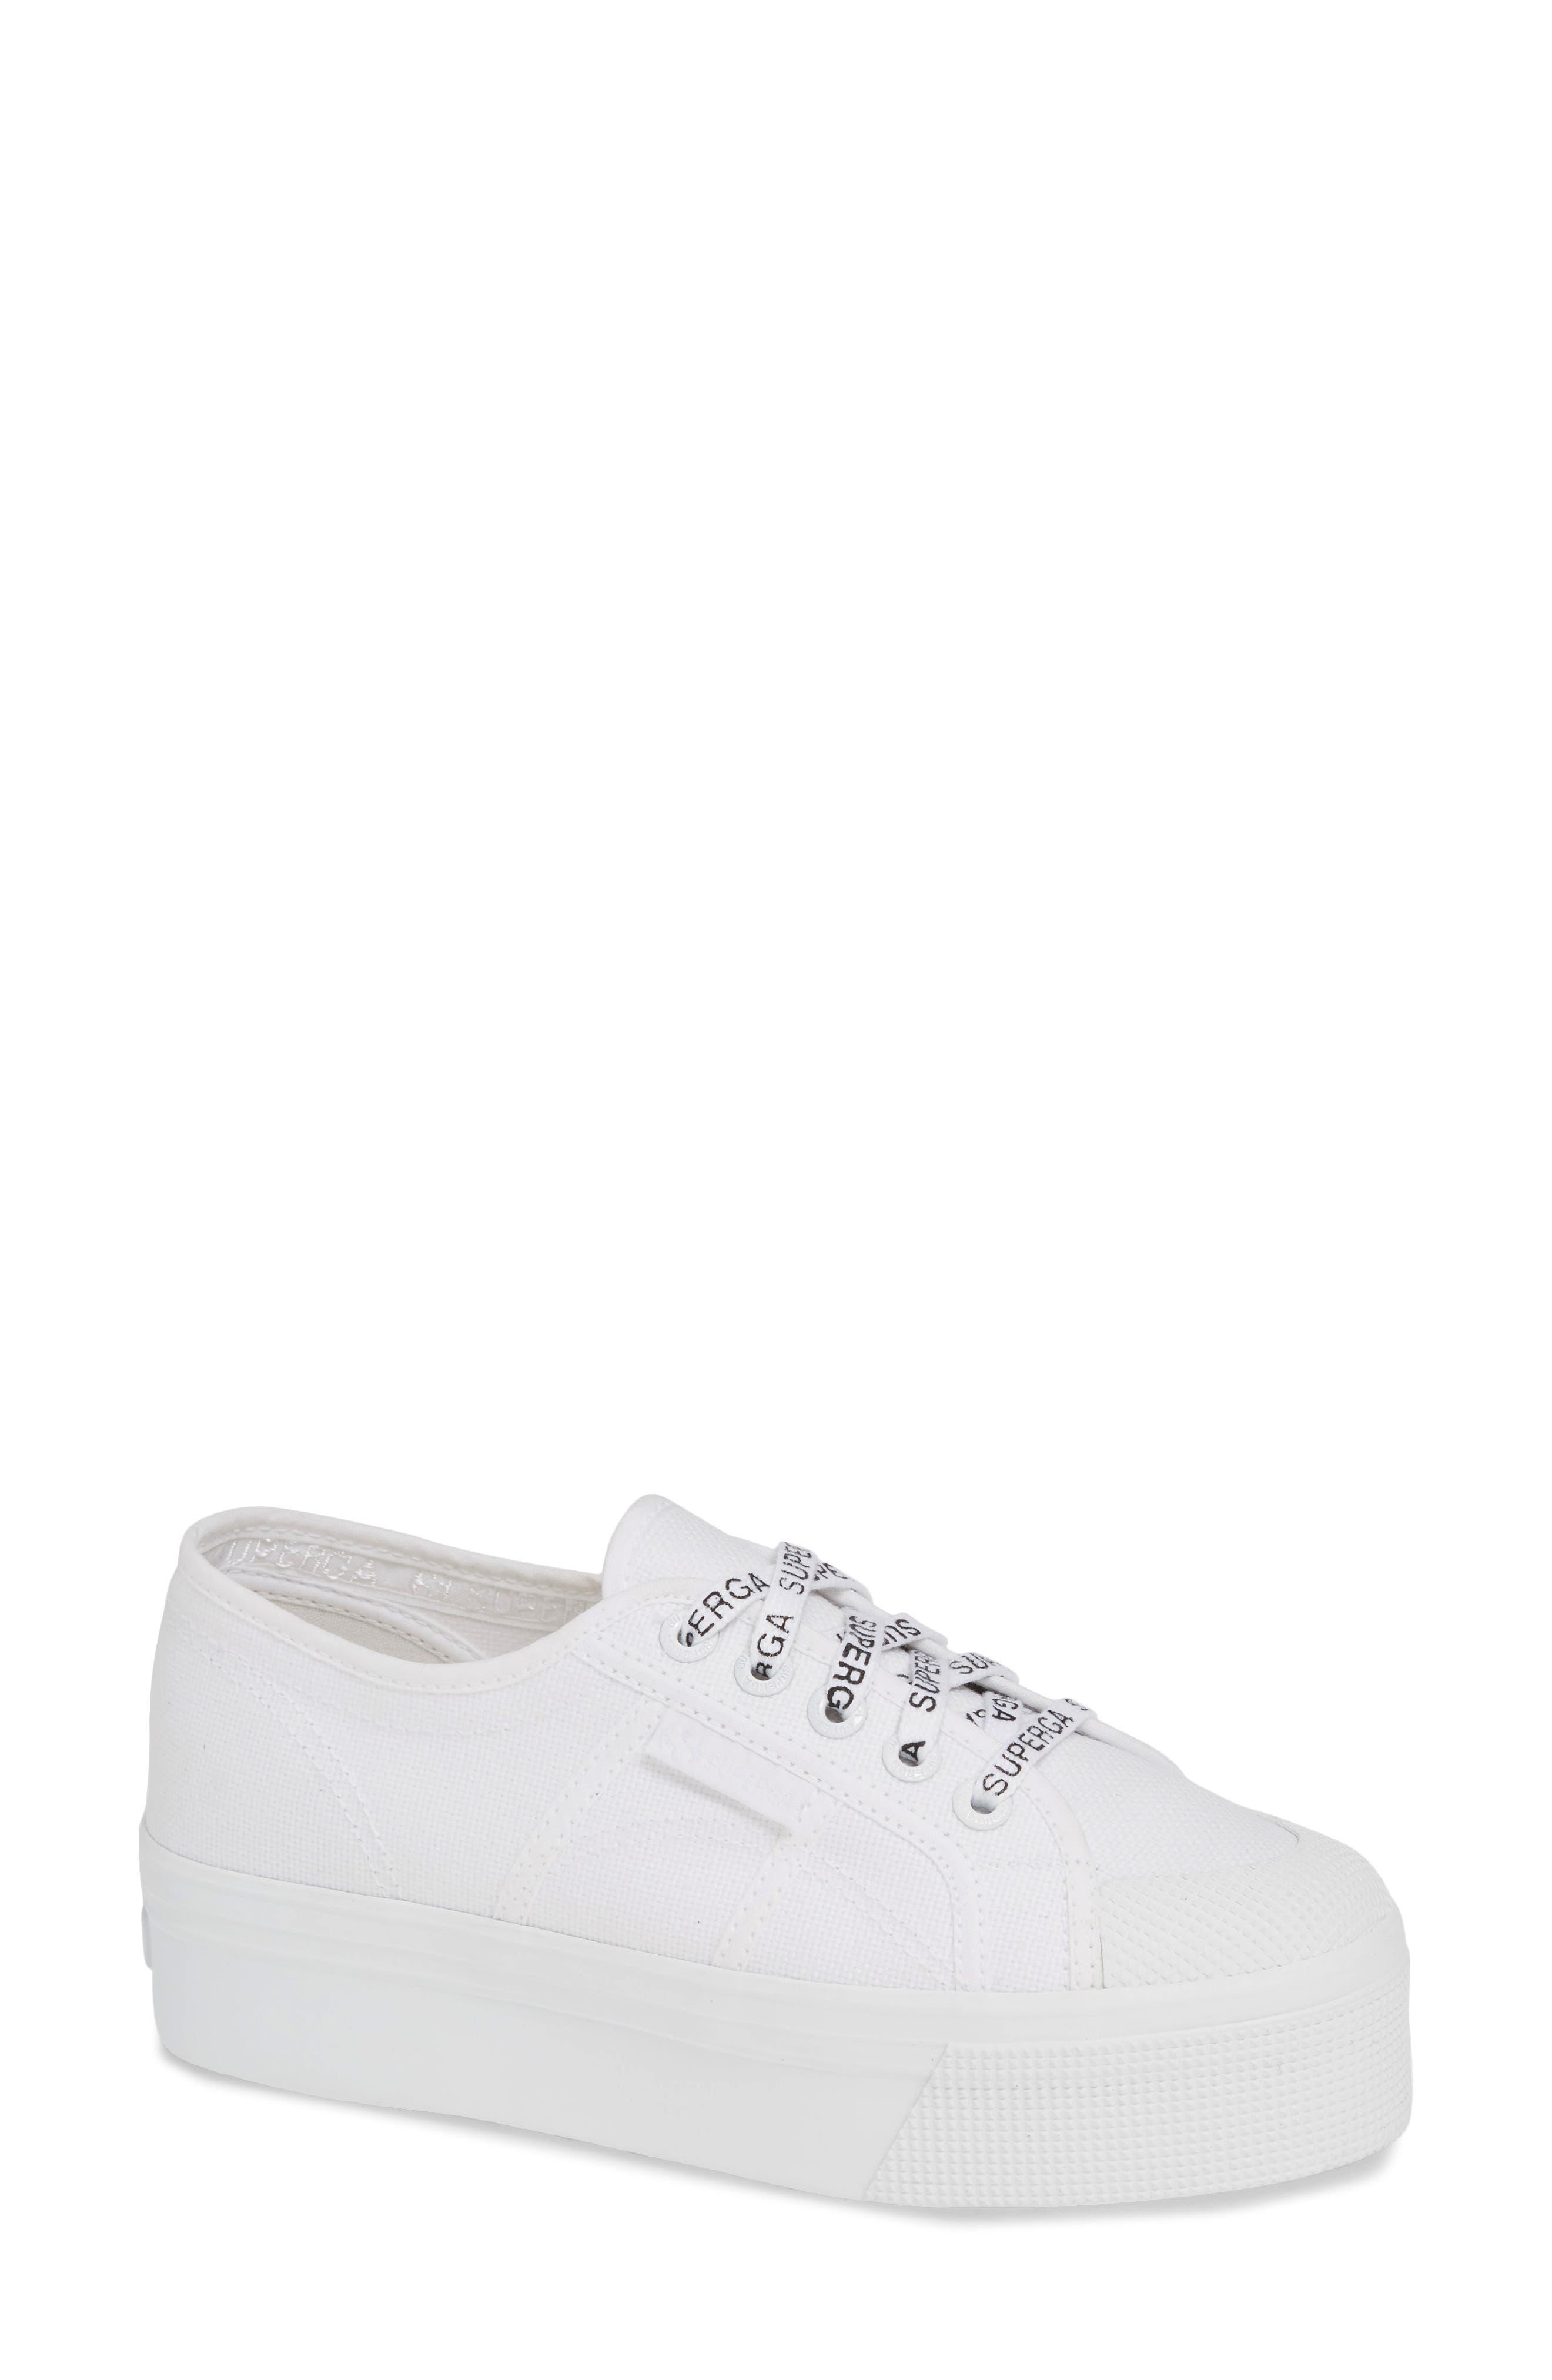 2405 Cotu Platform Sneaker,                             Main thumbnail 1, color,                             WHITE/ WHITE